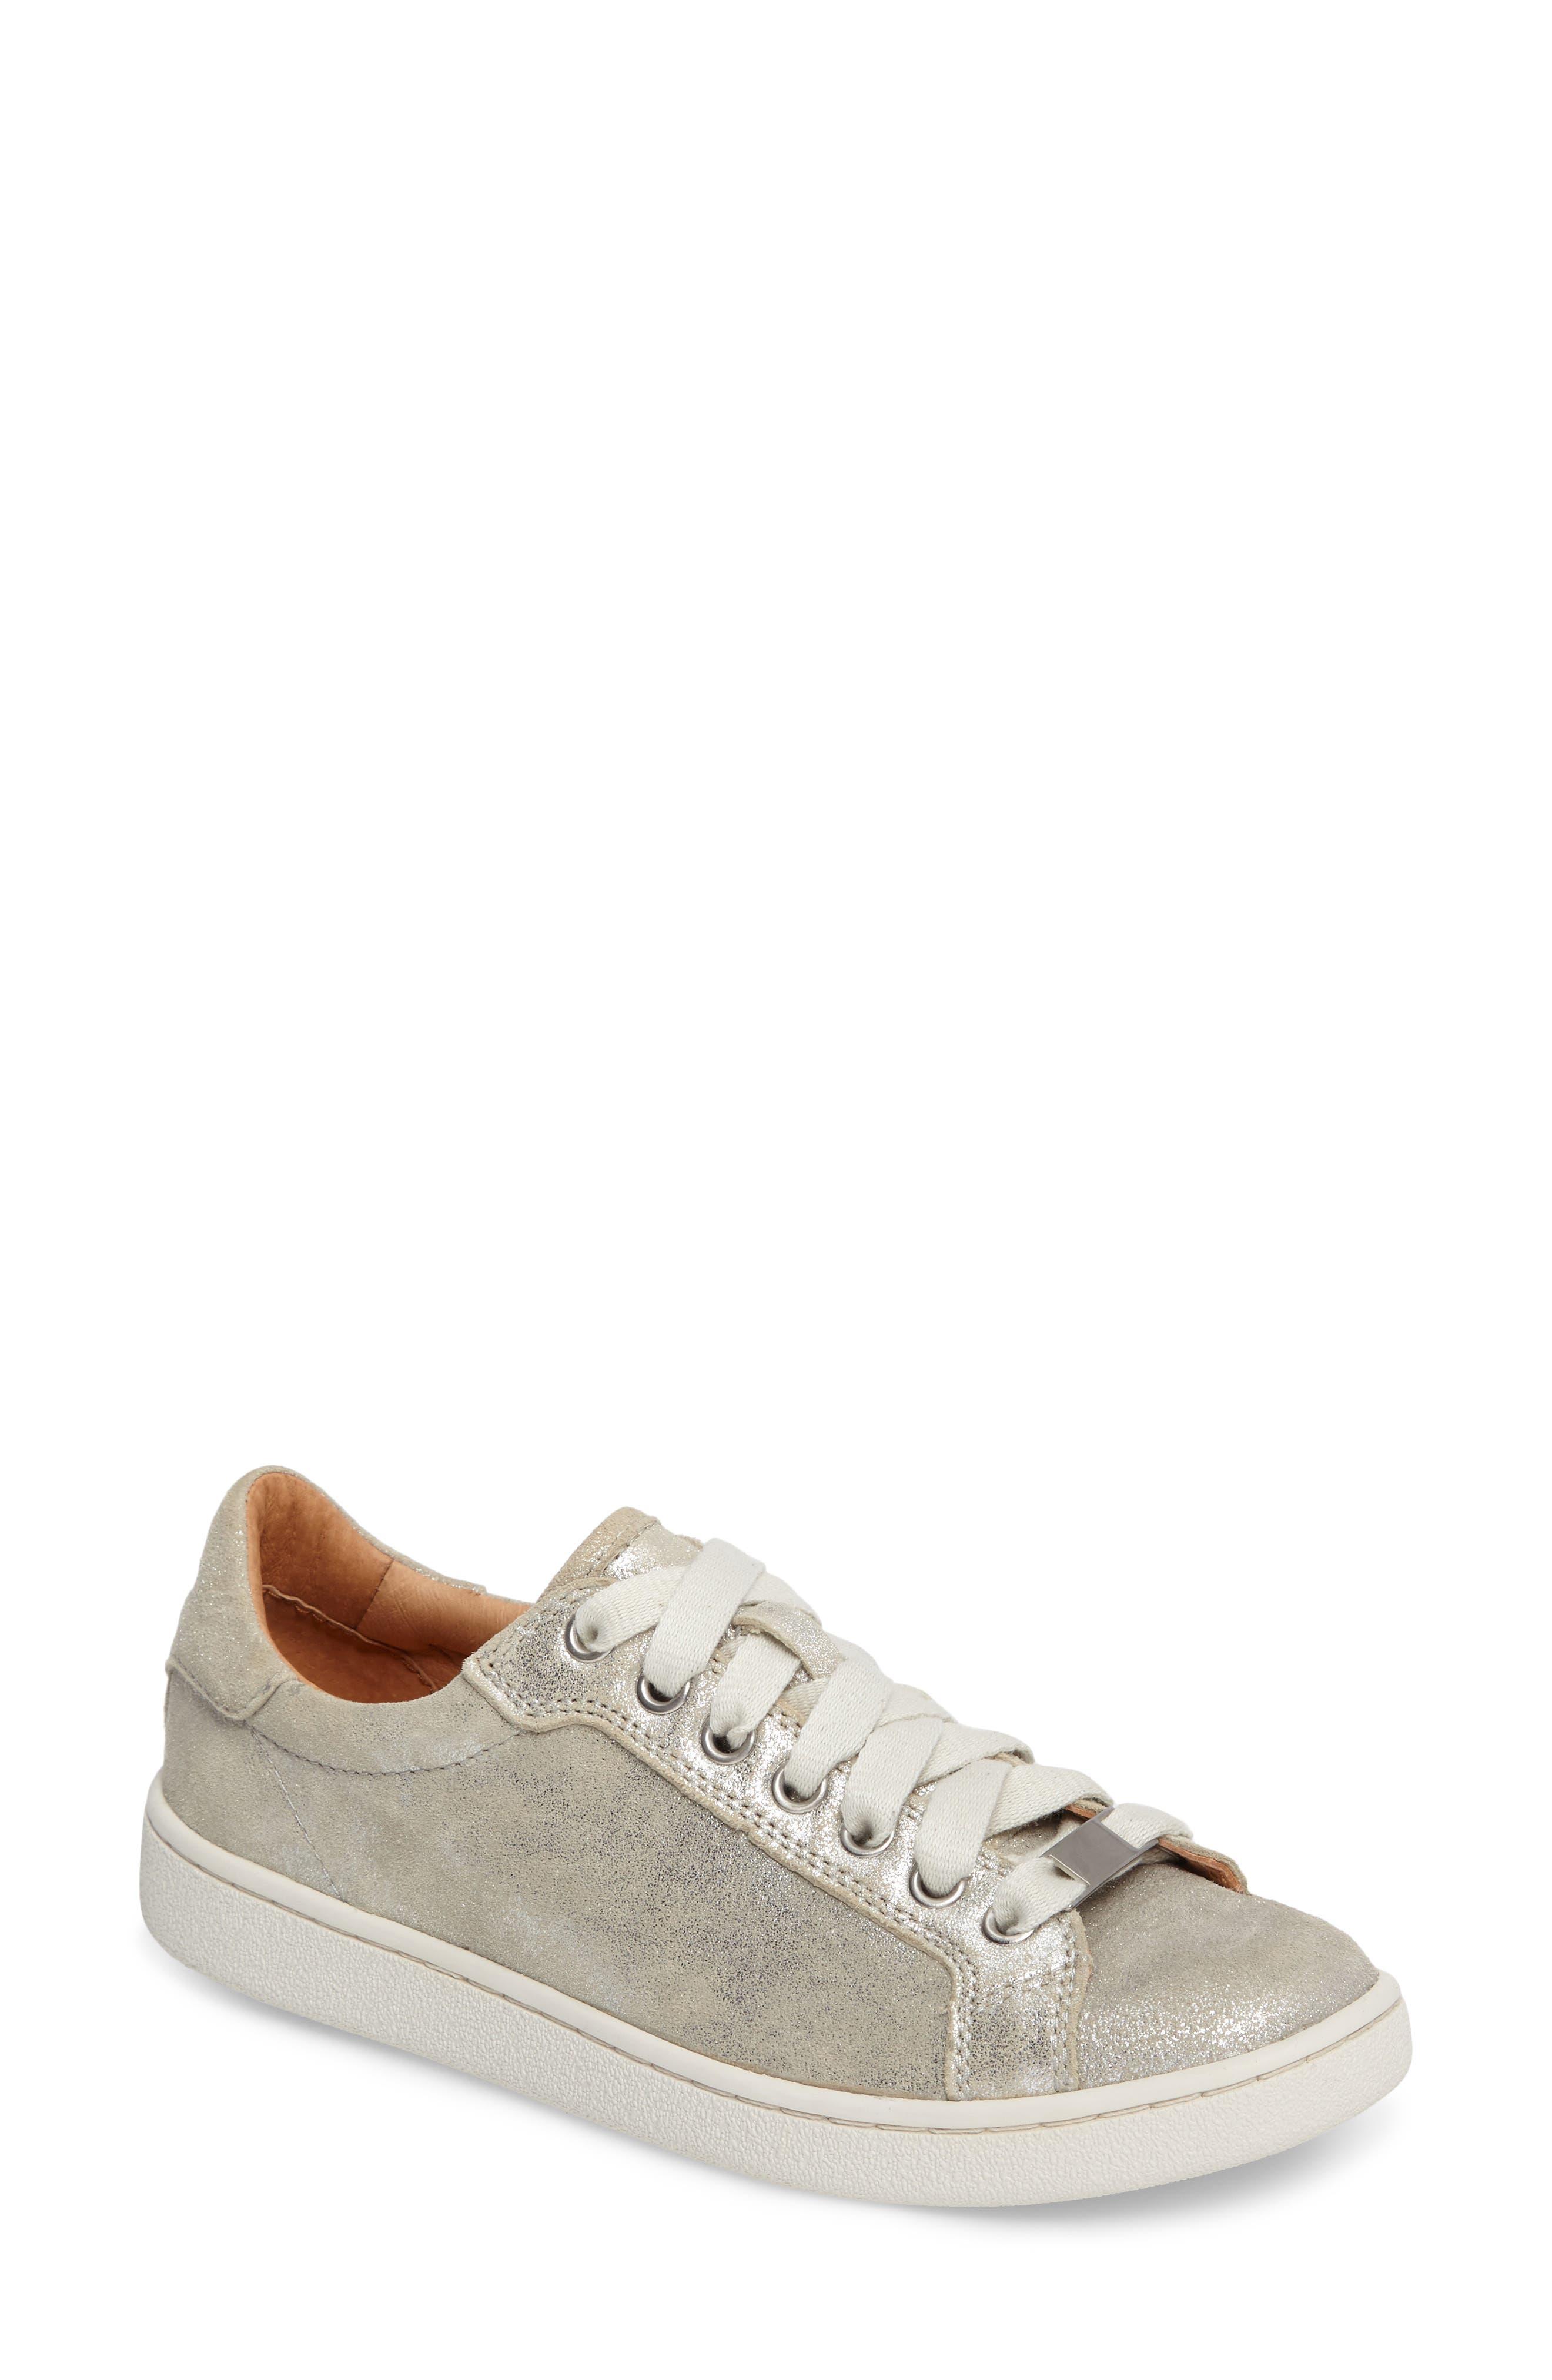 Alternate Image 1 Selected - UGG® Milo Stardust Sneaker (Women)